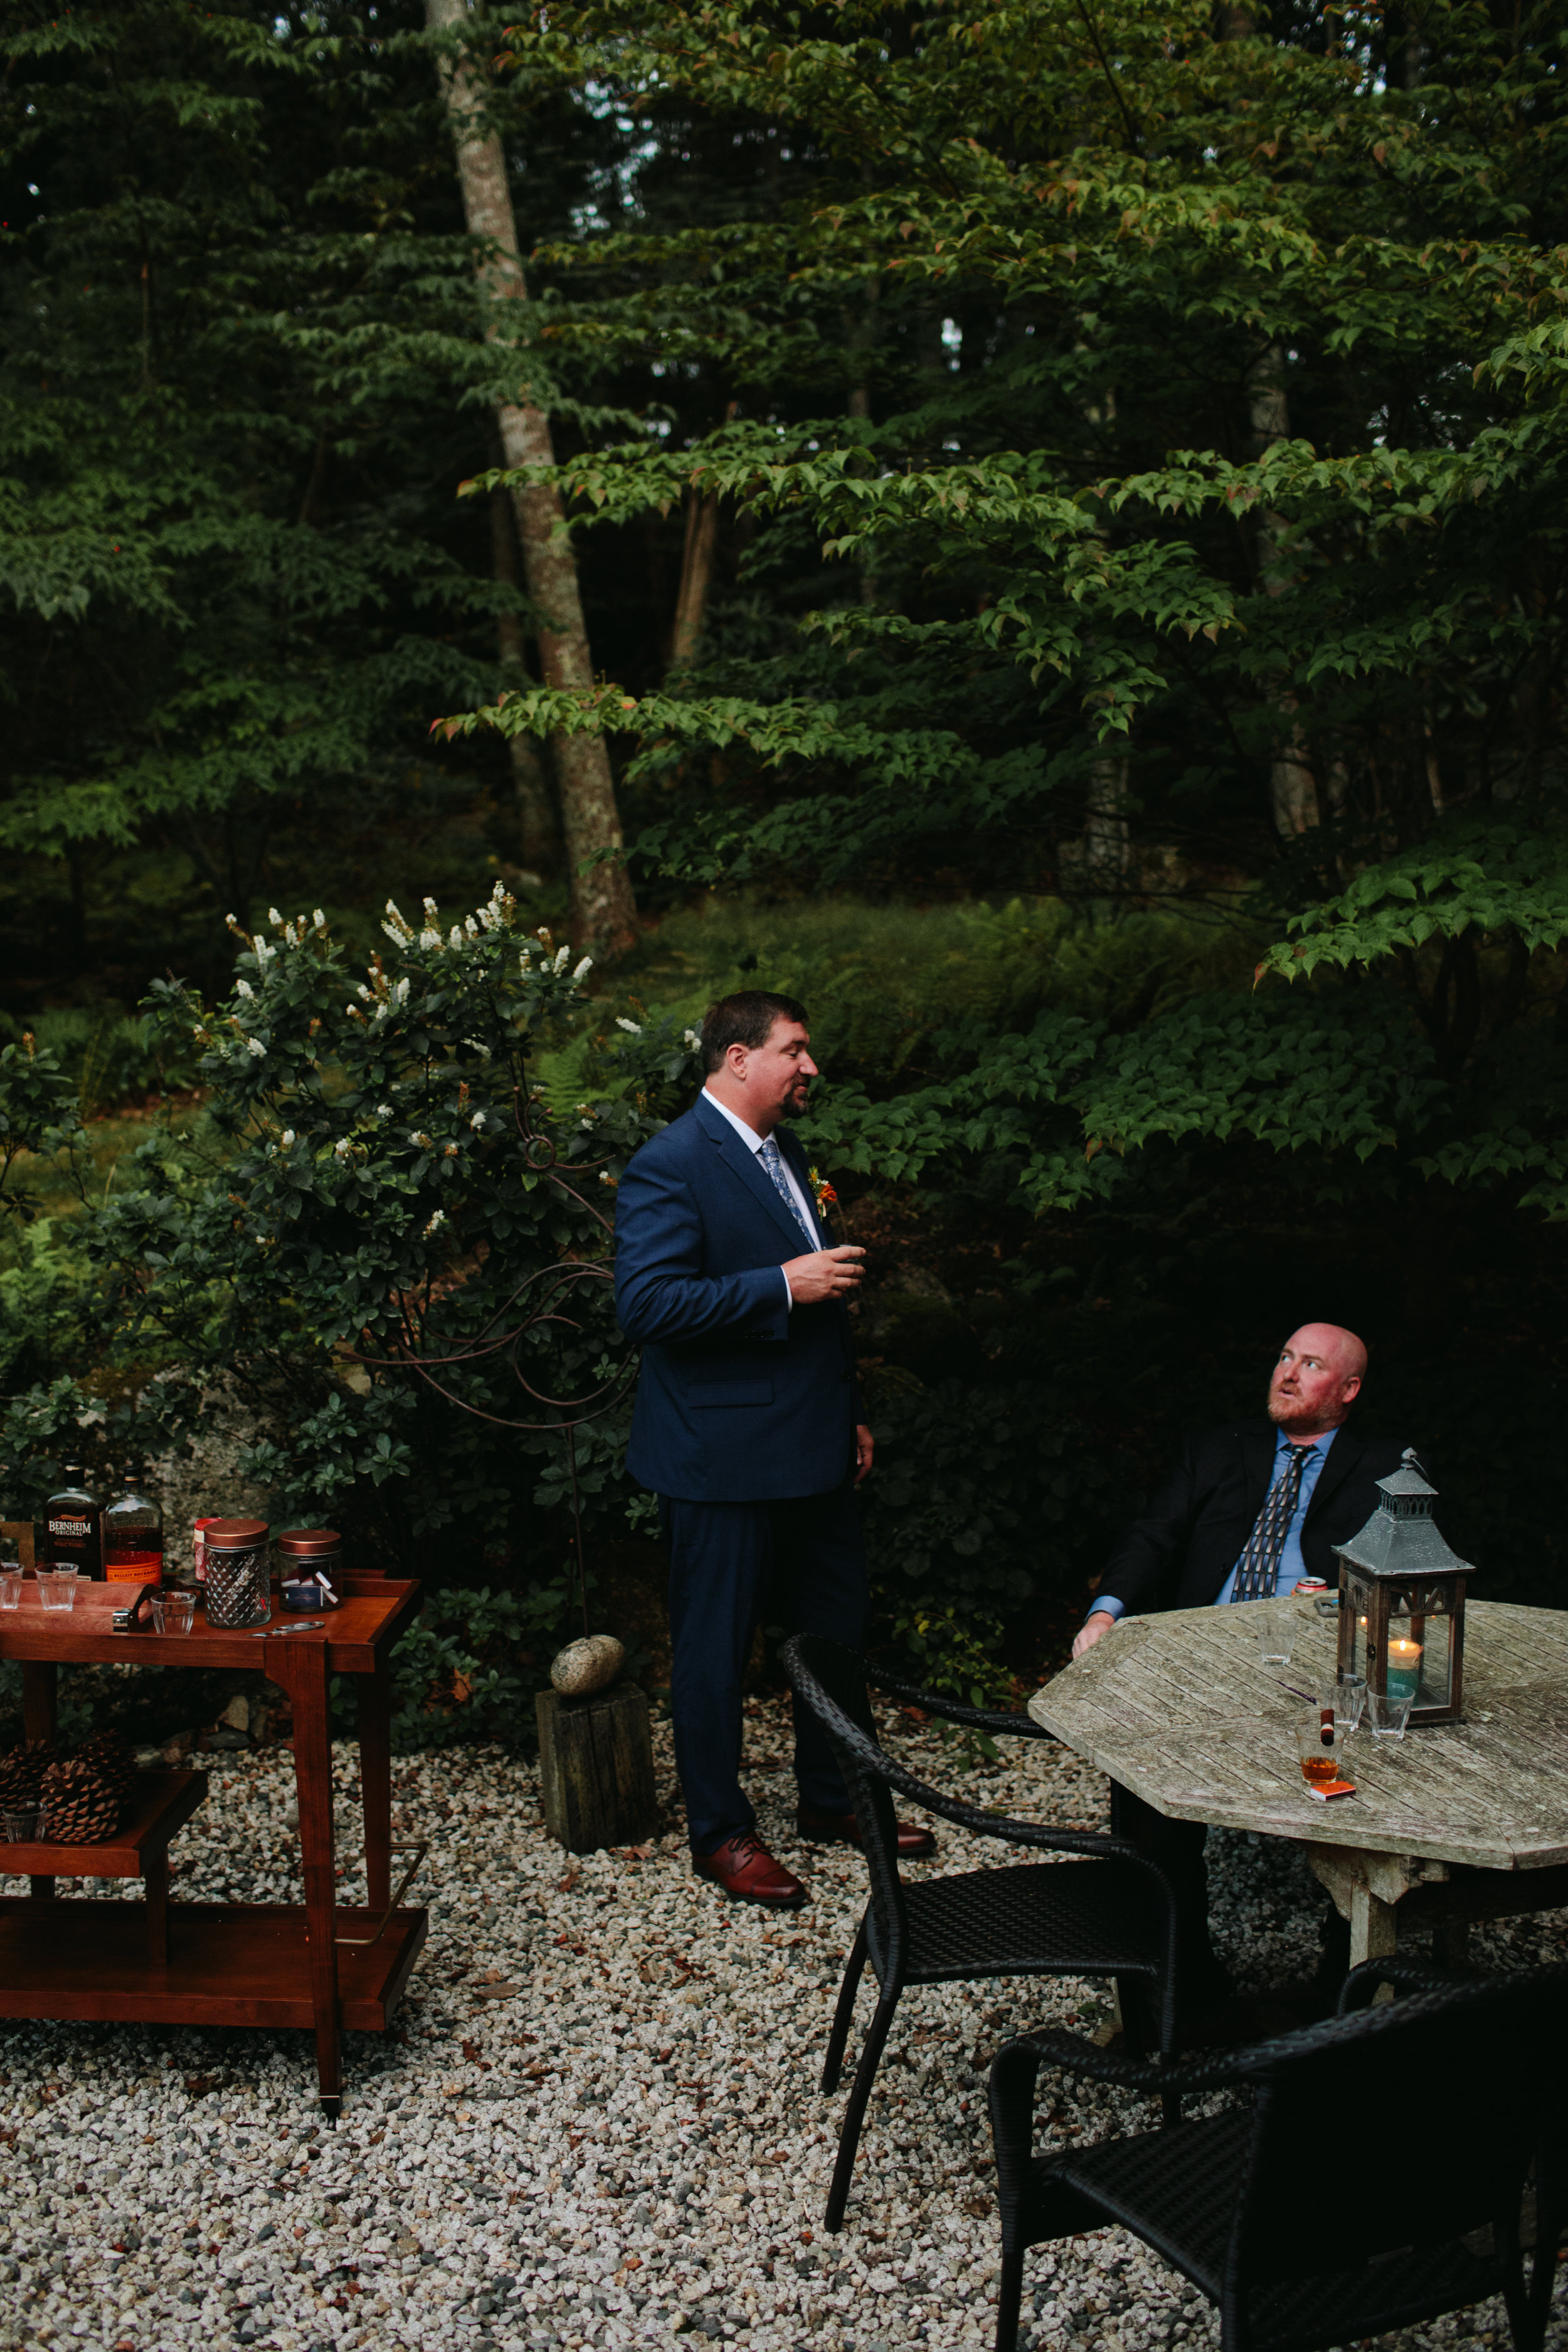 maine-wedding-georgetown-2.jpg